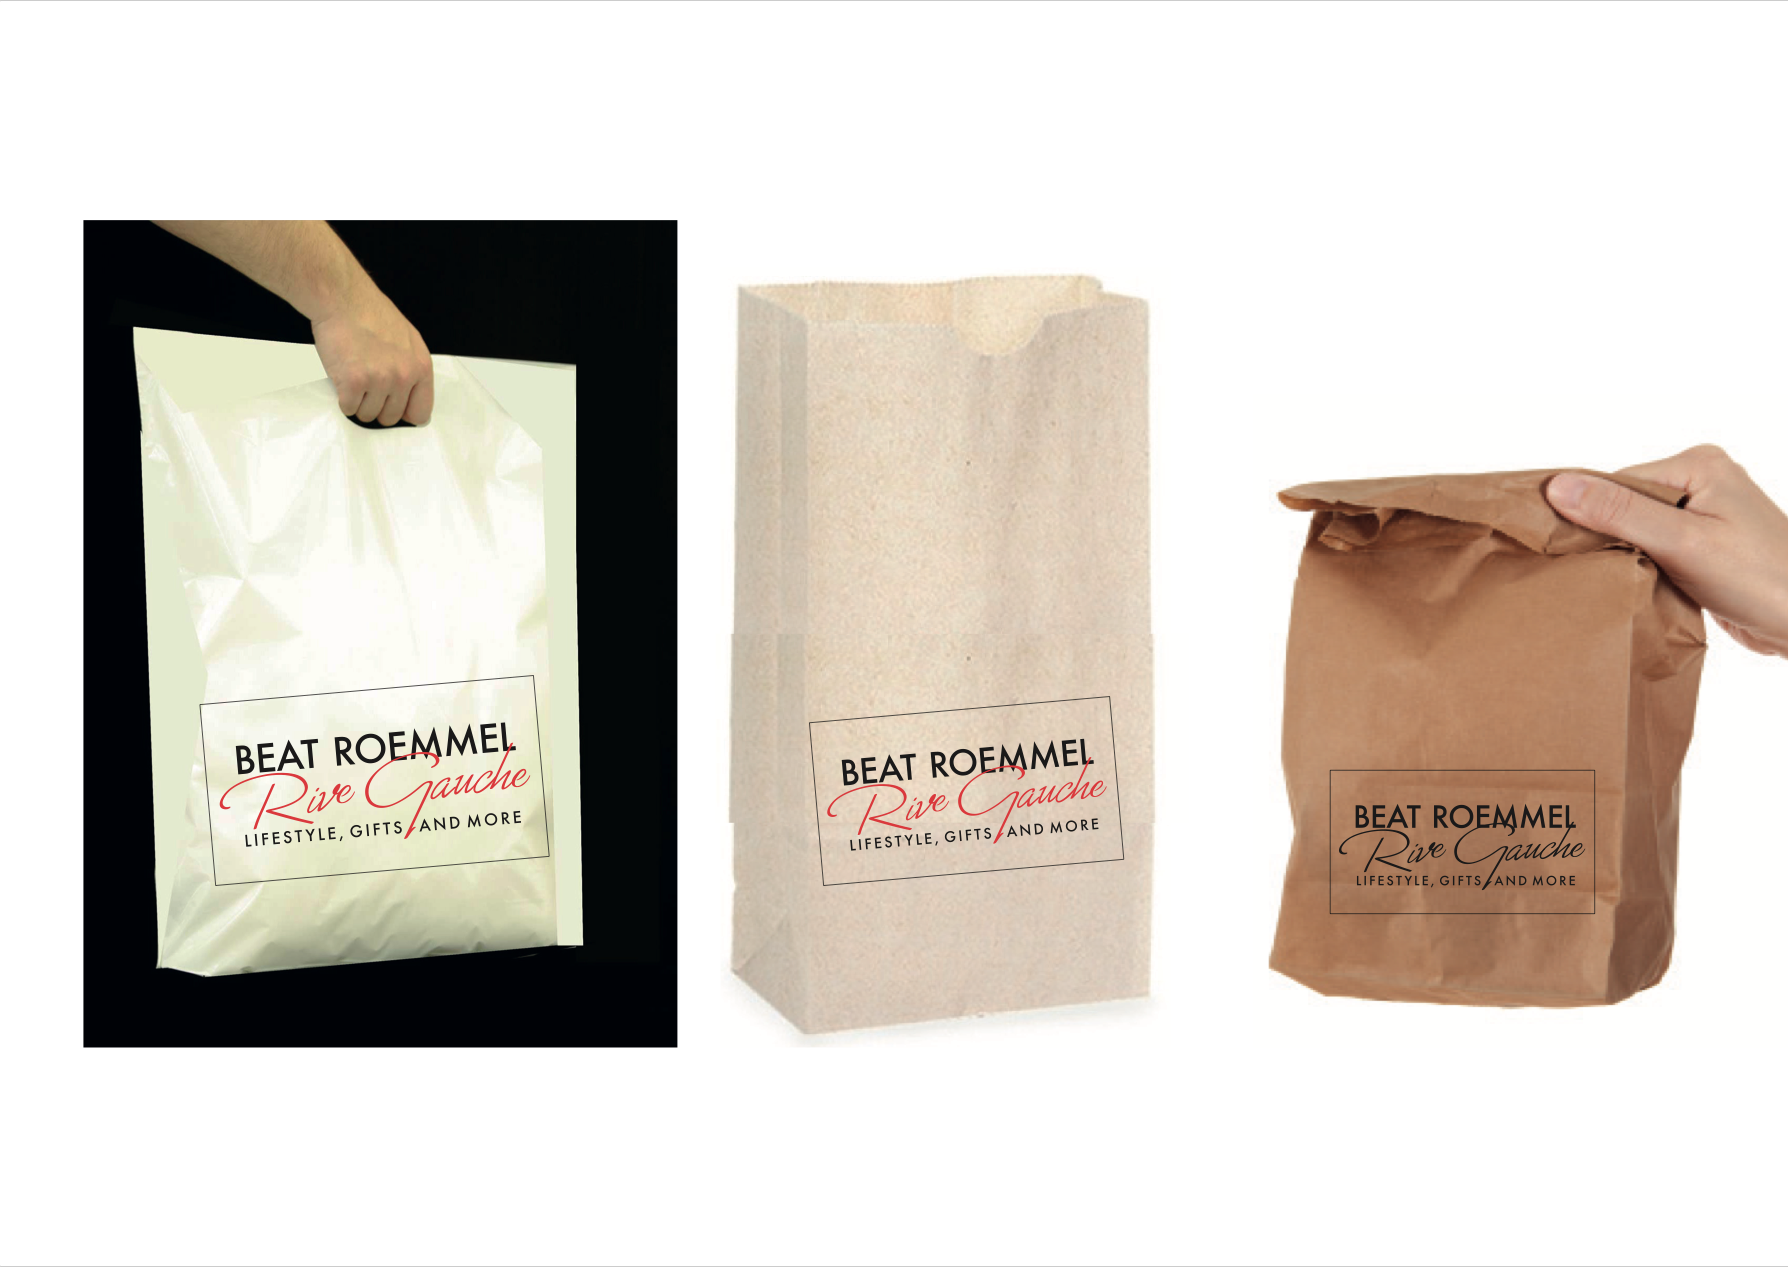 Rive Gauche Packaging